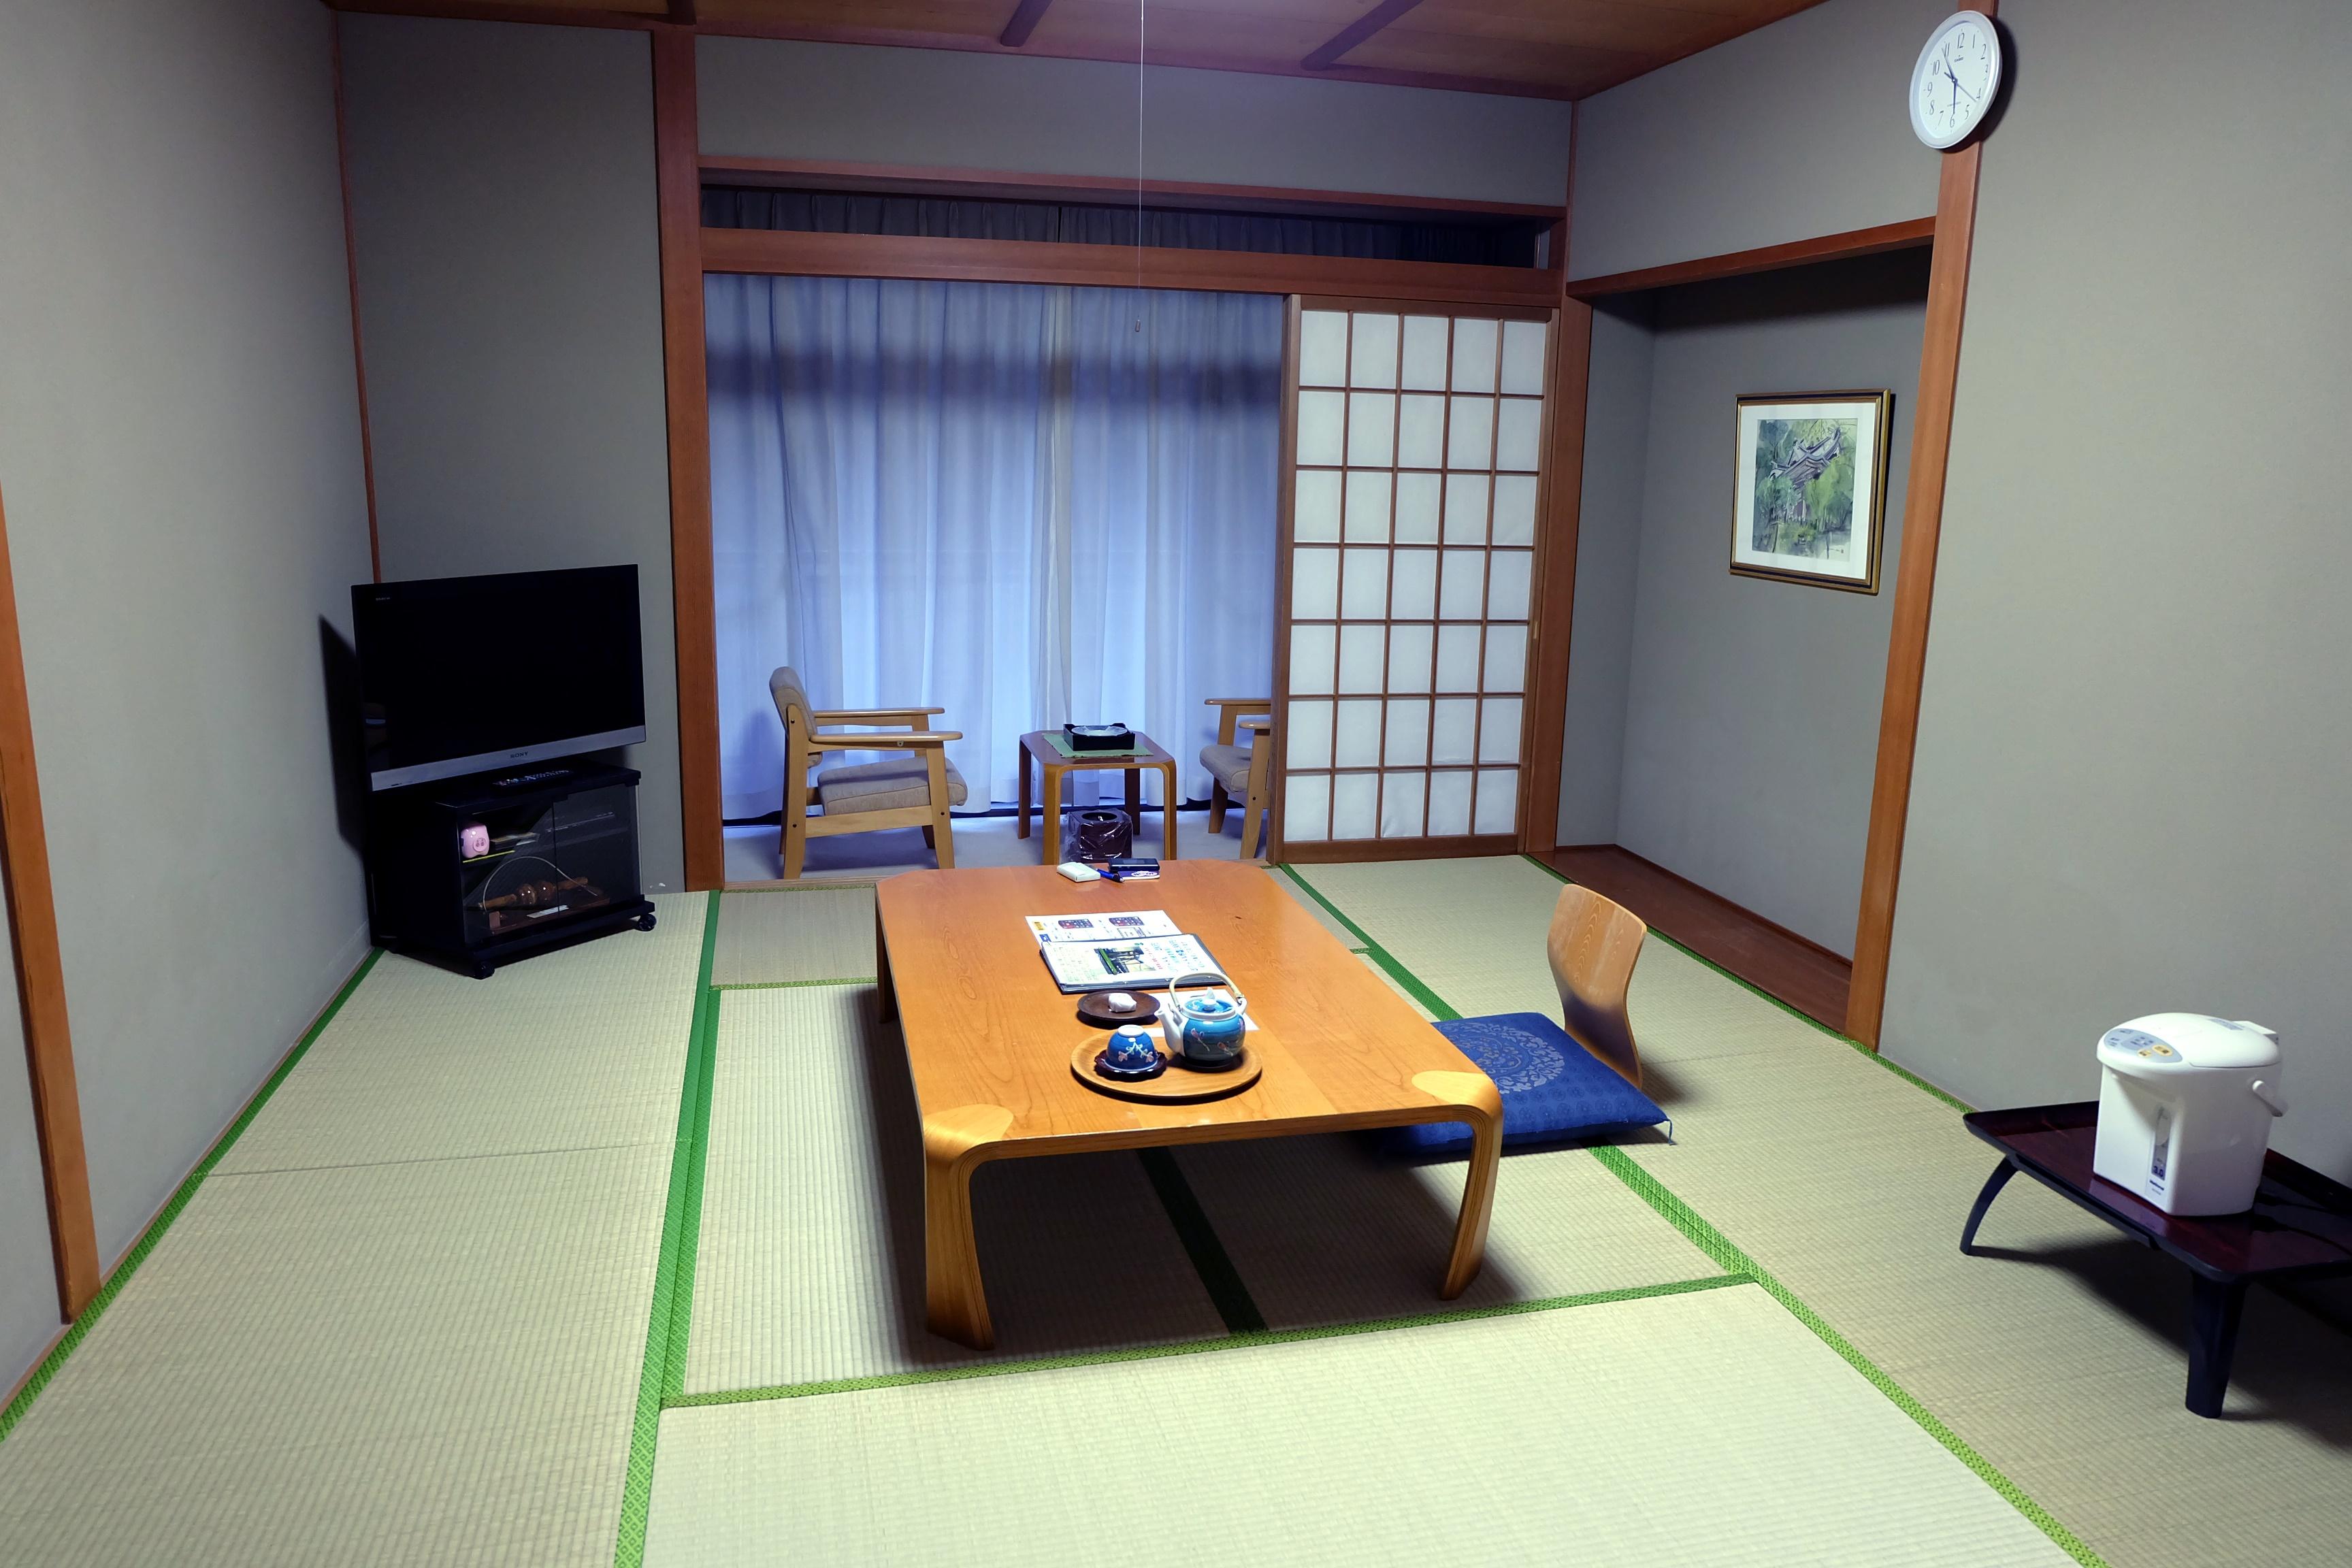 Ttsugawa Mura, Hotel Subaru DSCF7625